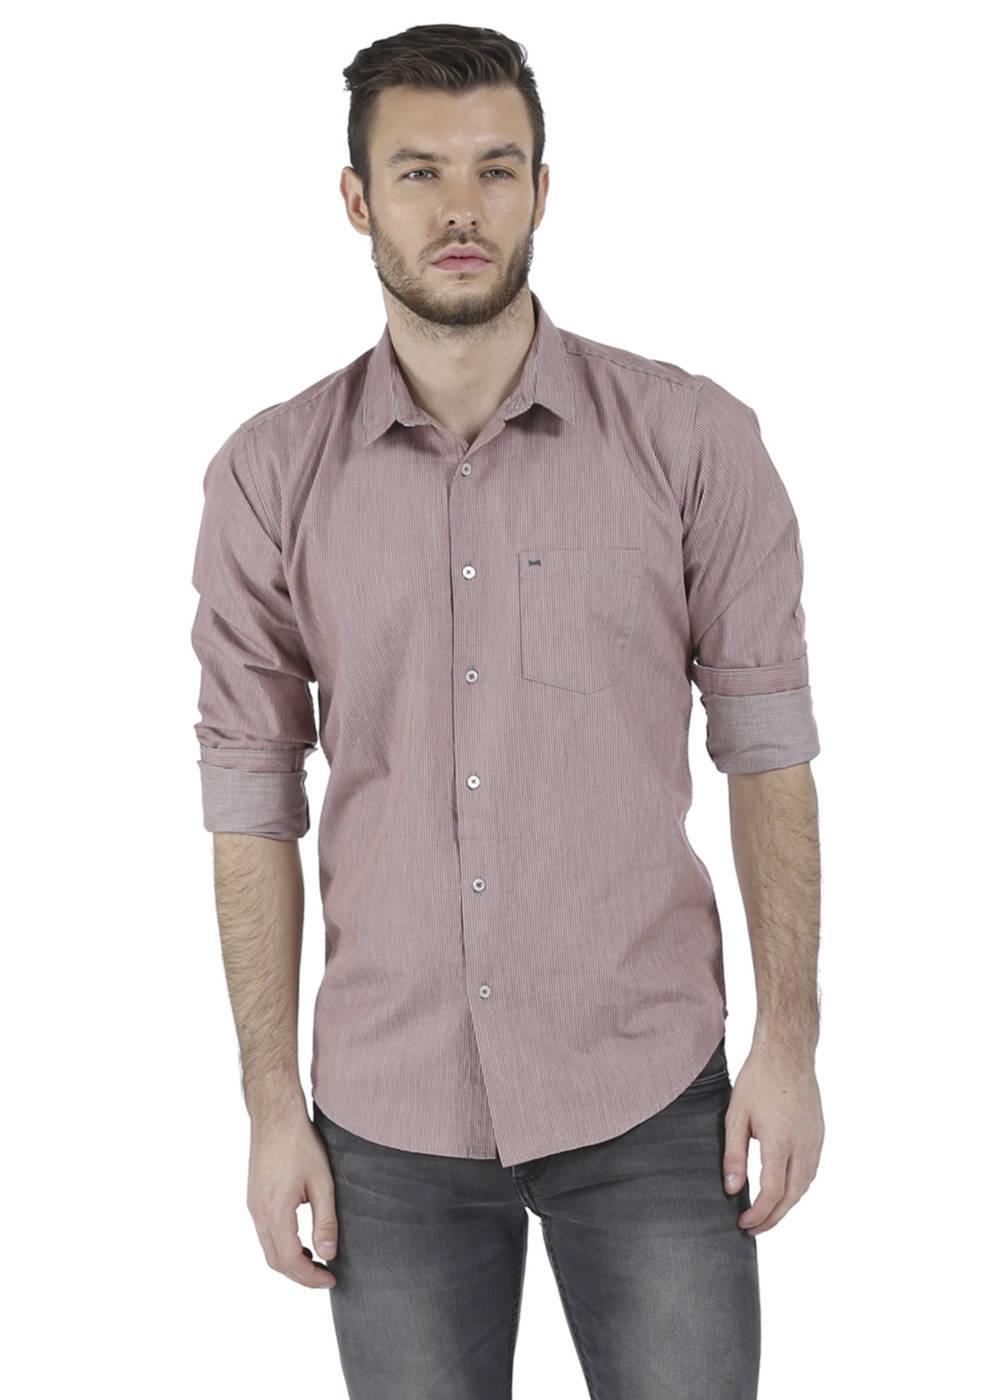 Basics   Basics Slim Fit Mineral Red Melange Shirt-16BSH34190